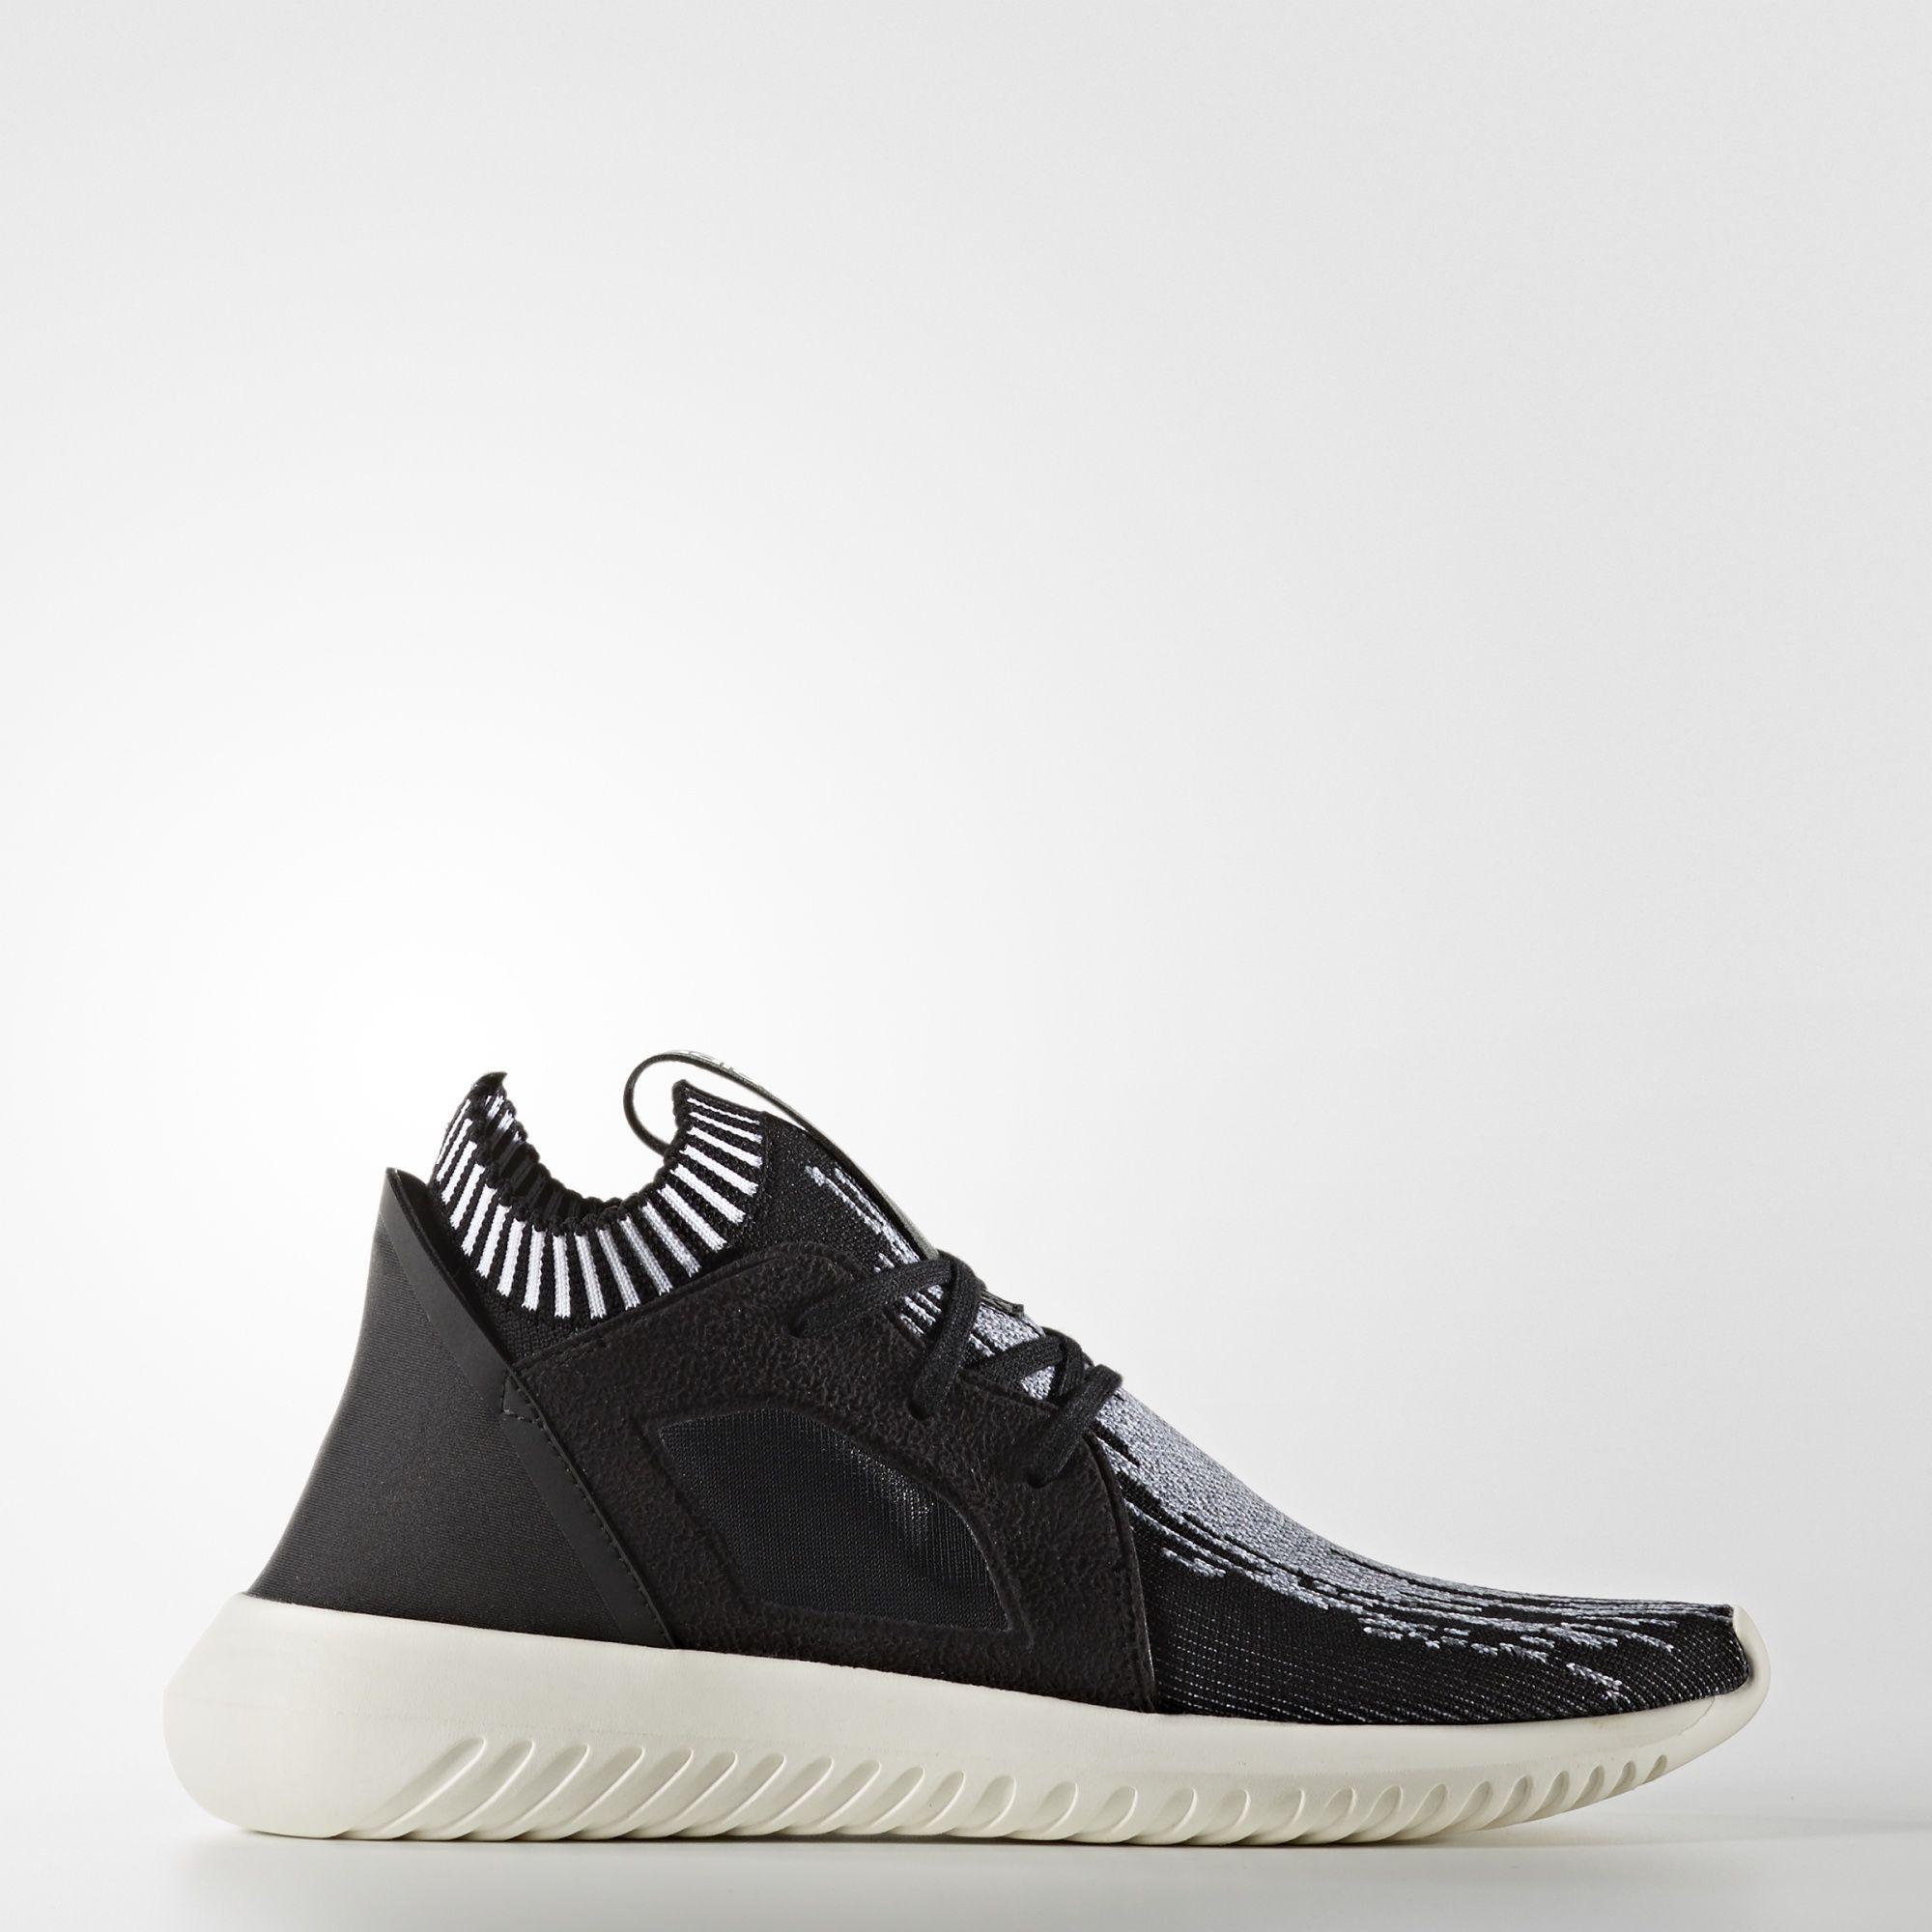 adidas - Tubular Defiant Prime knit Shoes women's (Size ...